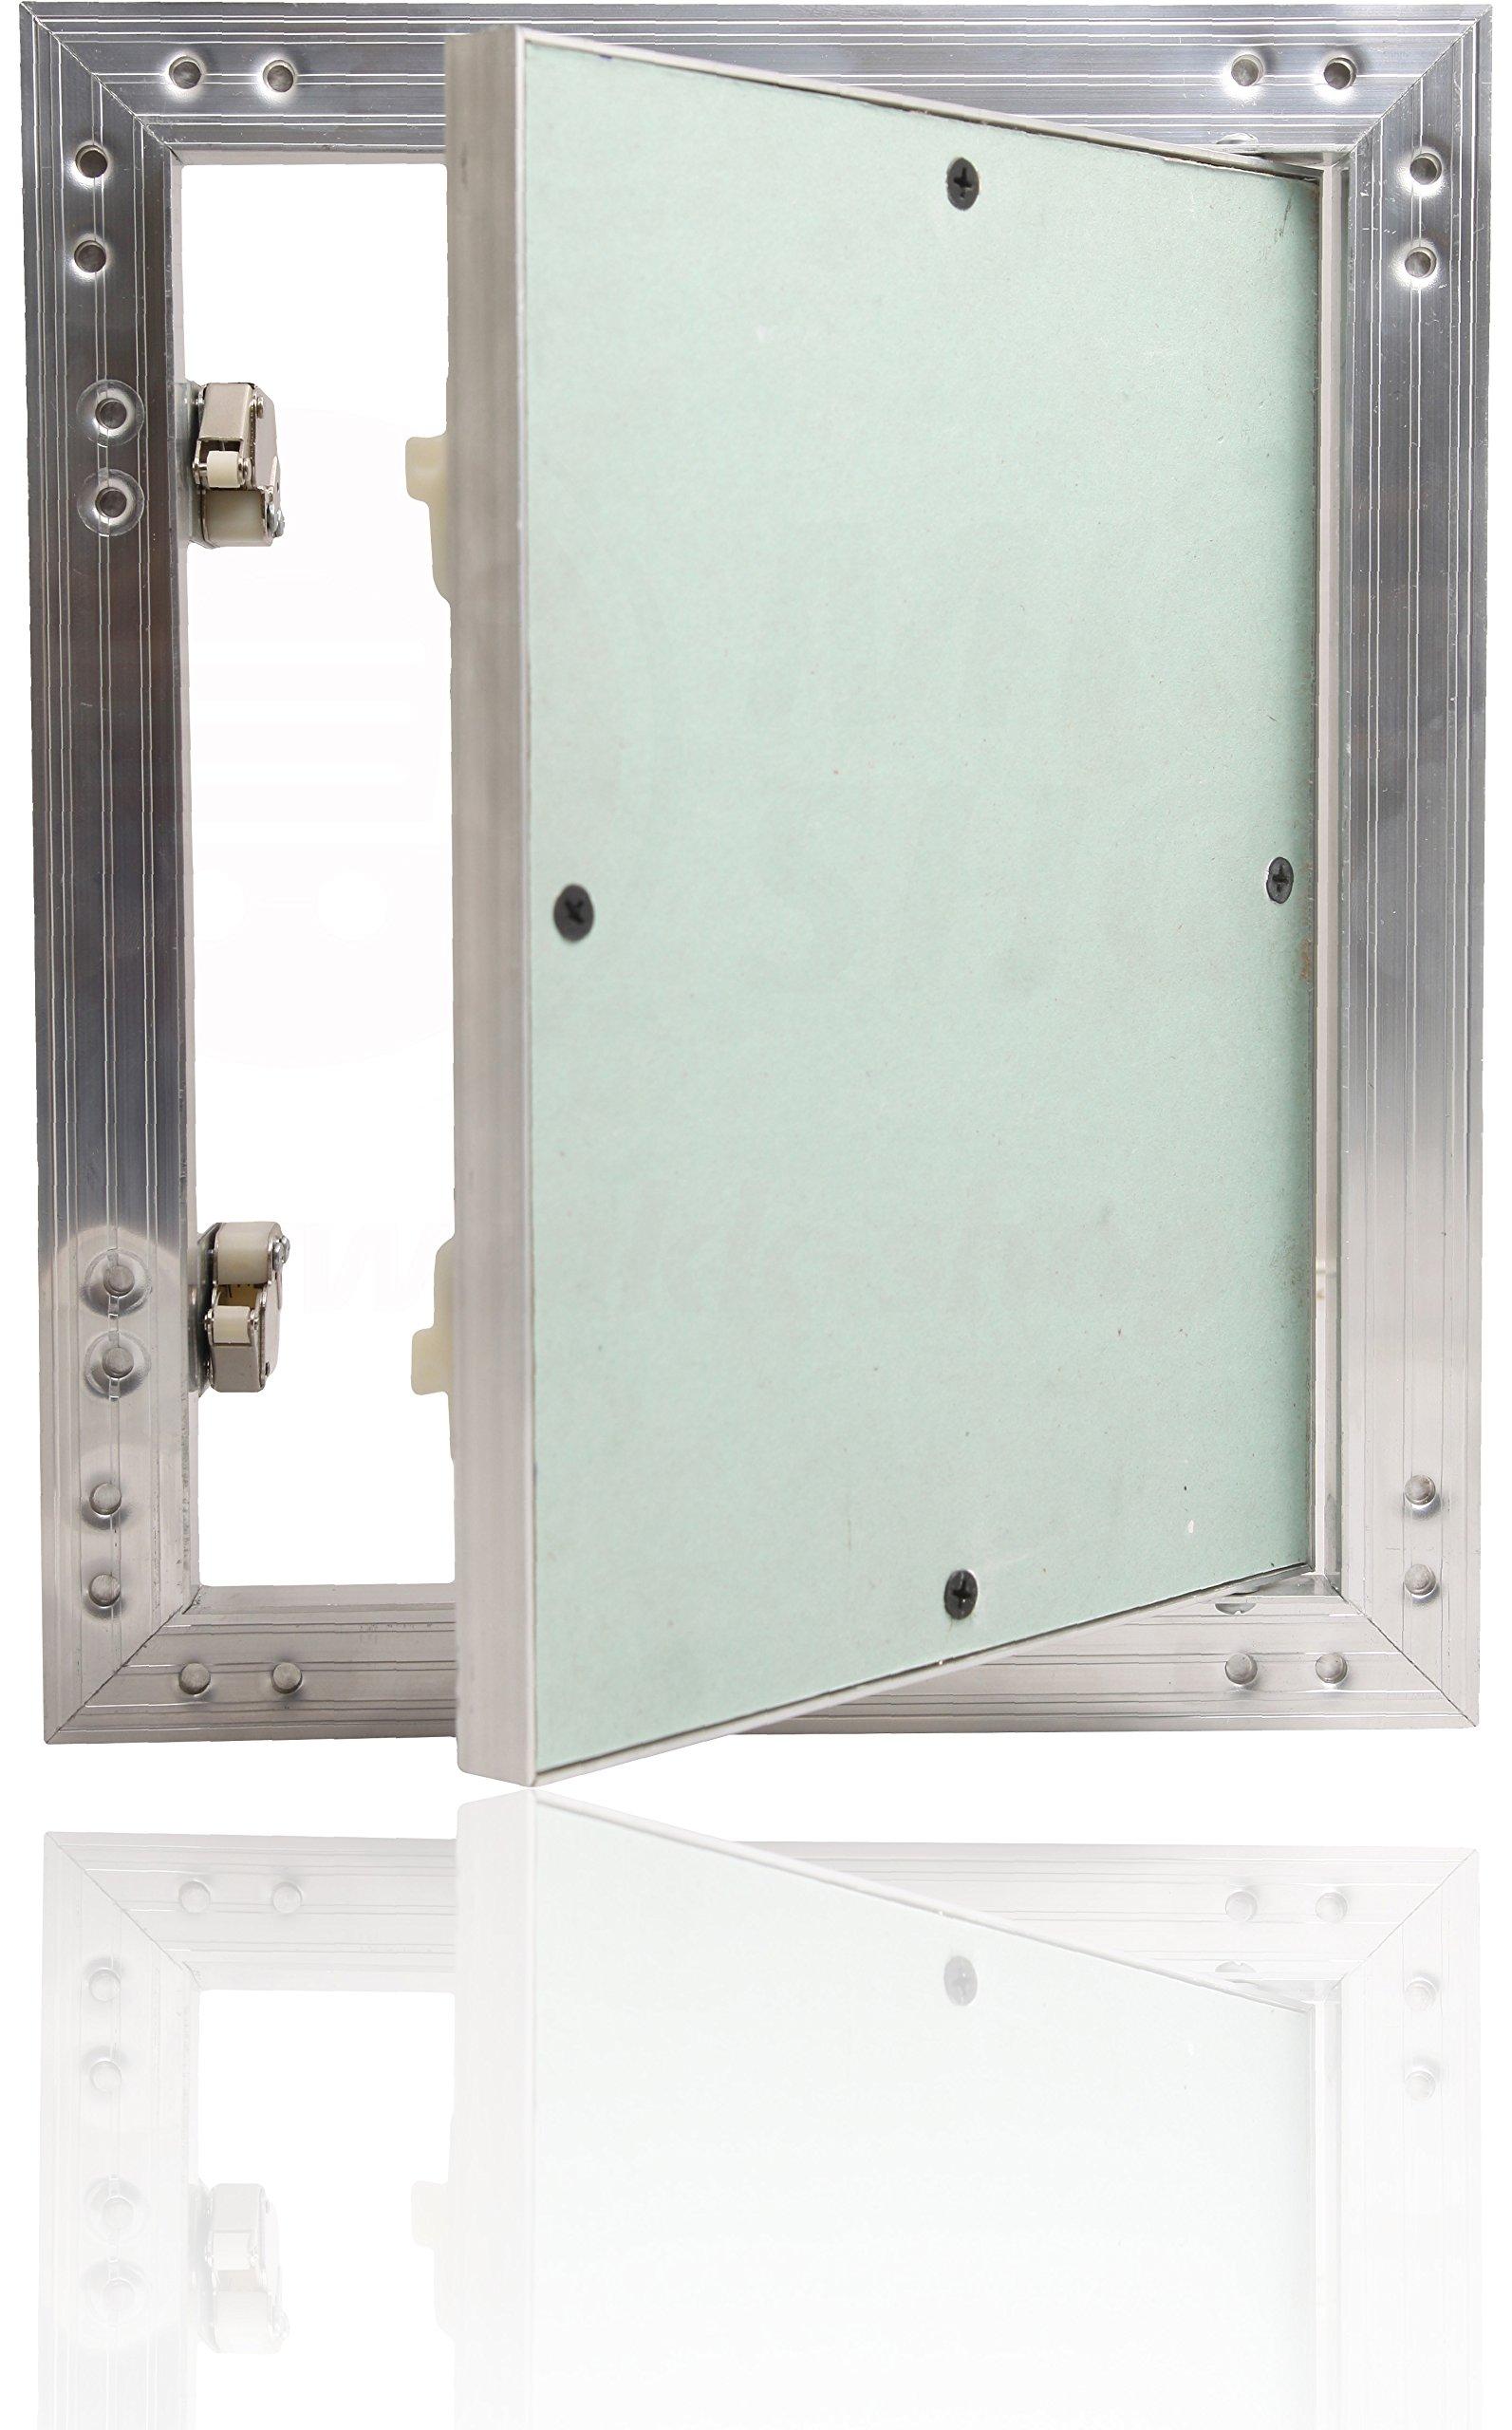 Tapa para revisión GK – Tapa (300 x 800 mm yeso 12,5 mm kral34 pladur Revisión Mantenimiento Puerta 30 x 80 cm Mantenimiento Tapa de limpieza Mantenimiento Apertura con marco de aluminio